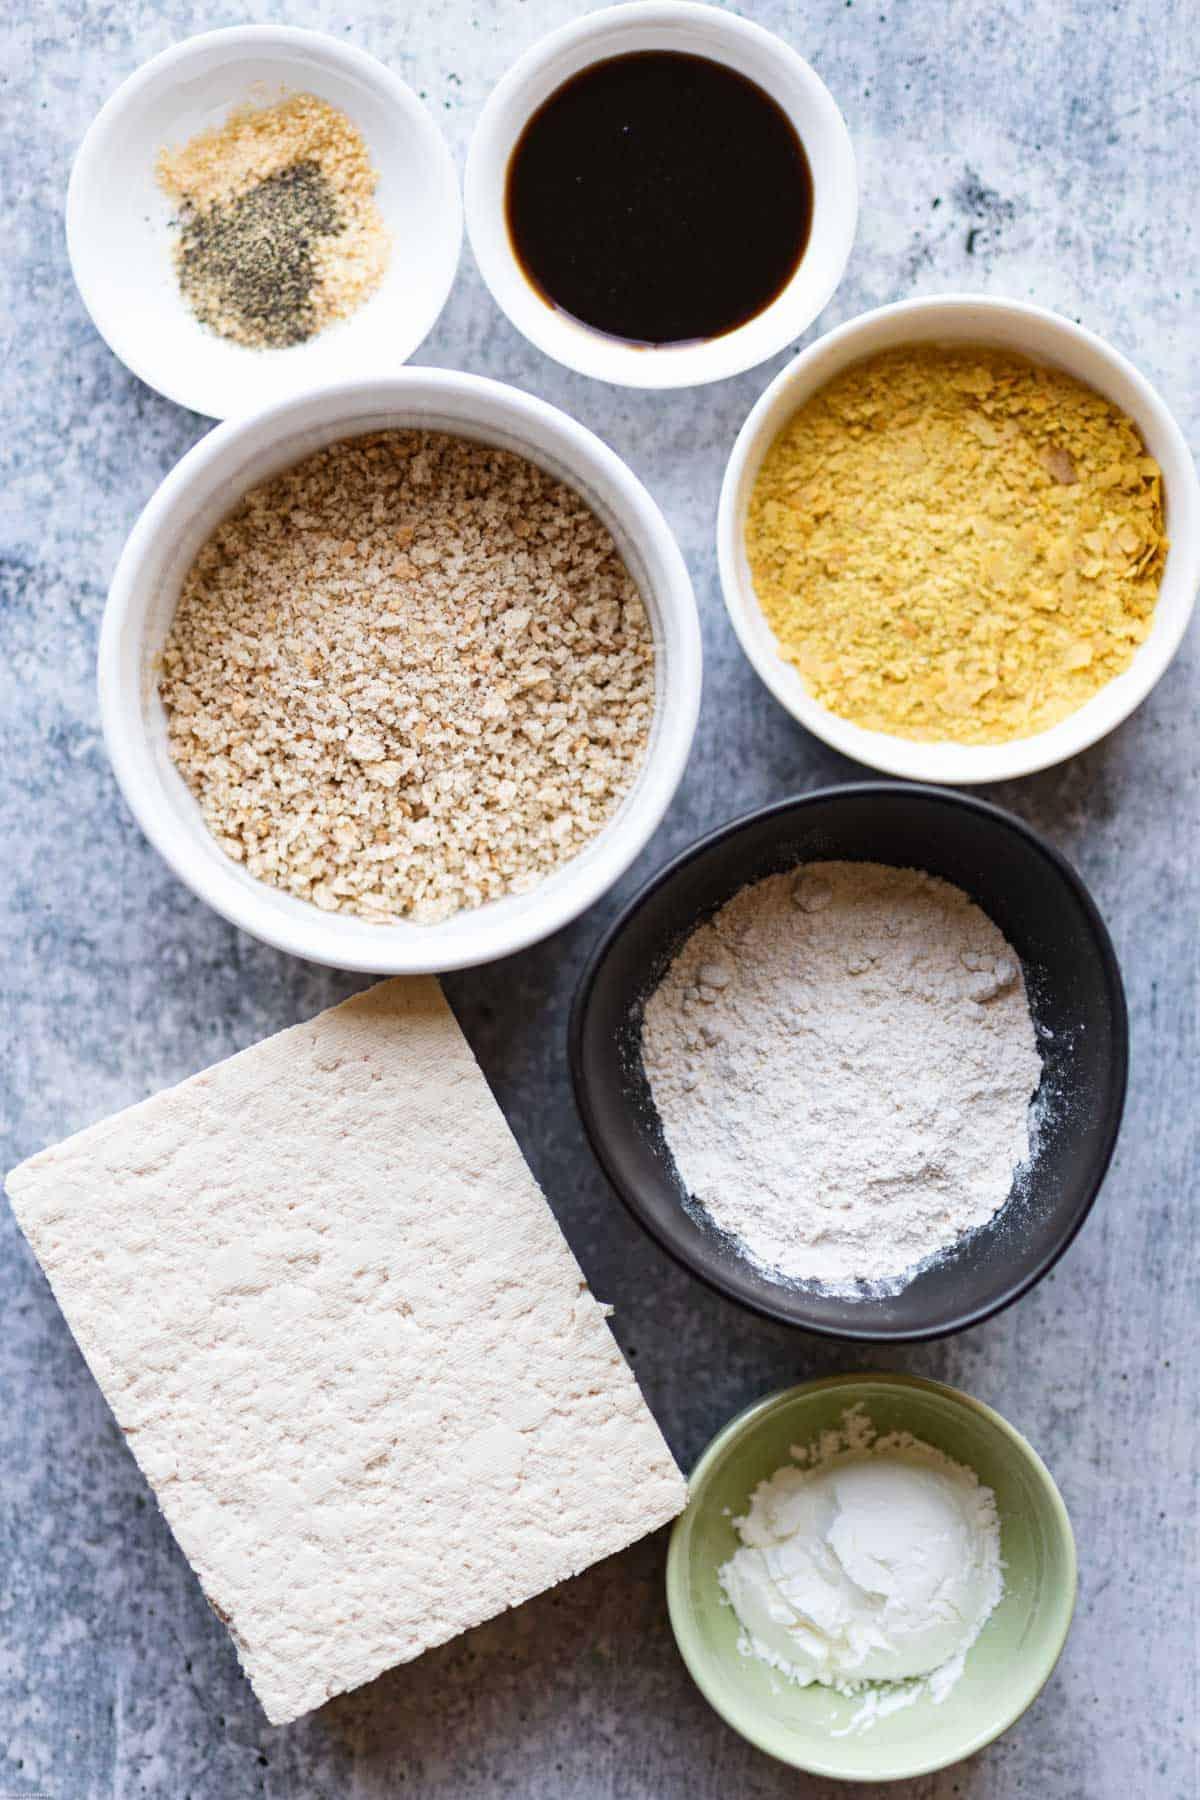 Tofu, panko, cornstarch, flour, nutritional yeast, coconut aminos, black pepper, onion powder, and garlic powder.